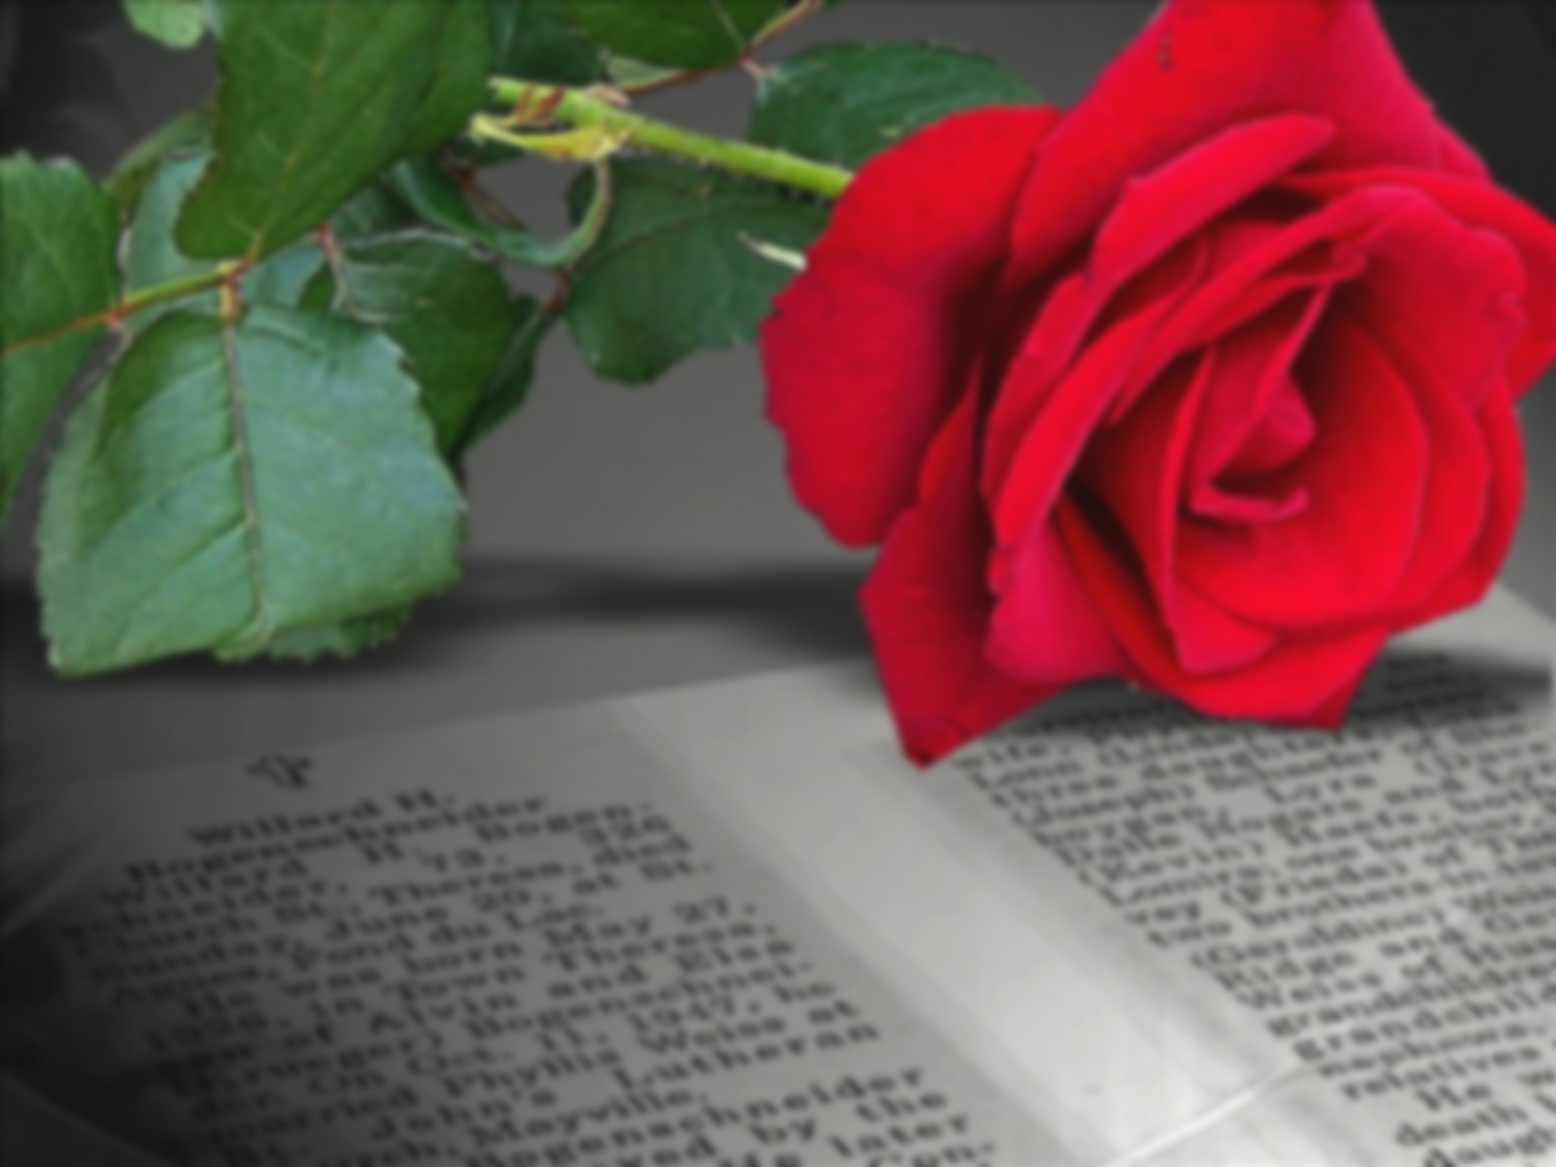 Obituary death_1555444615455.jpg.jpg